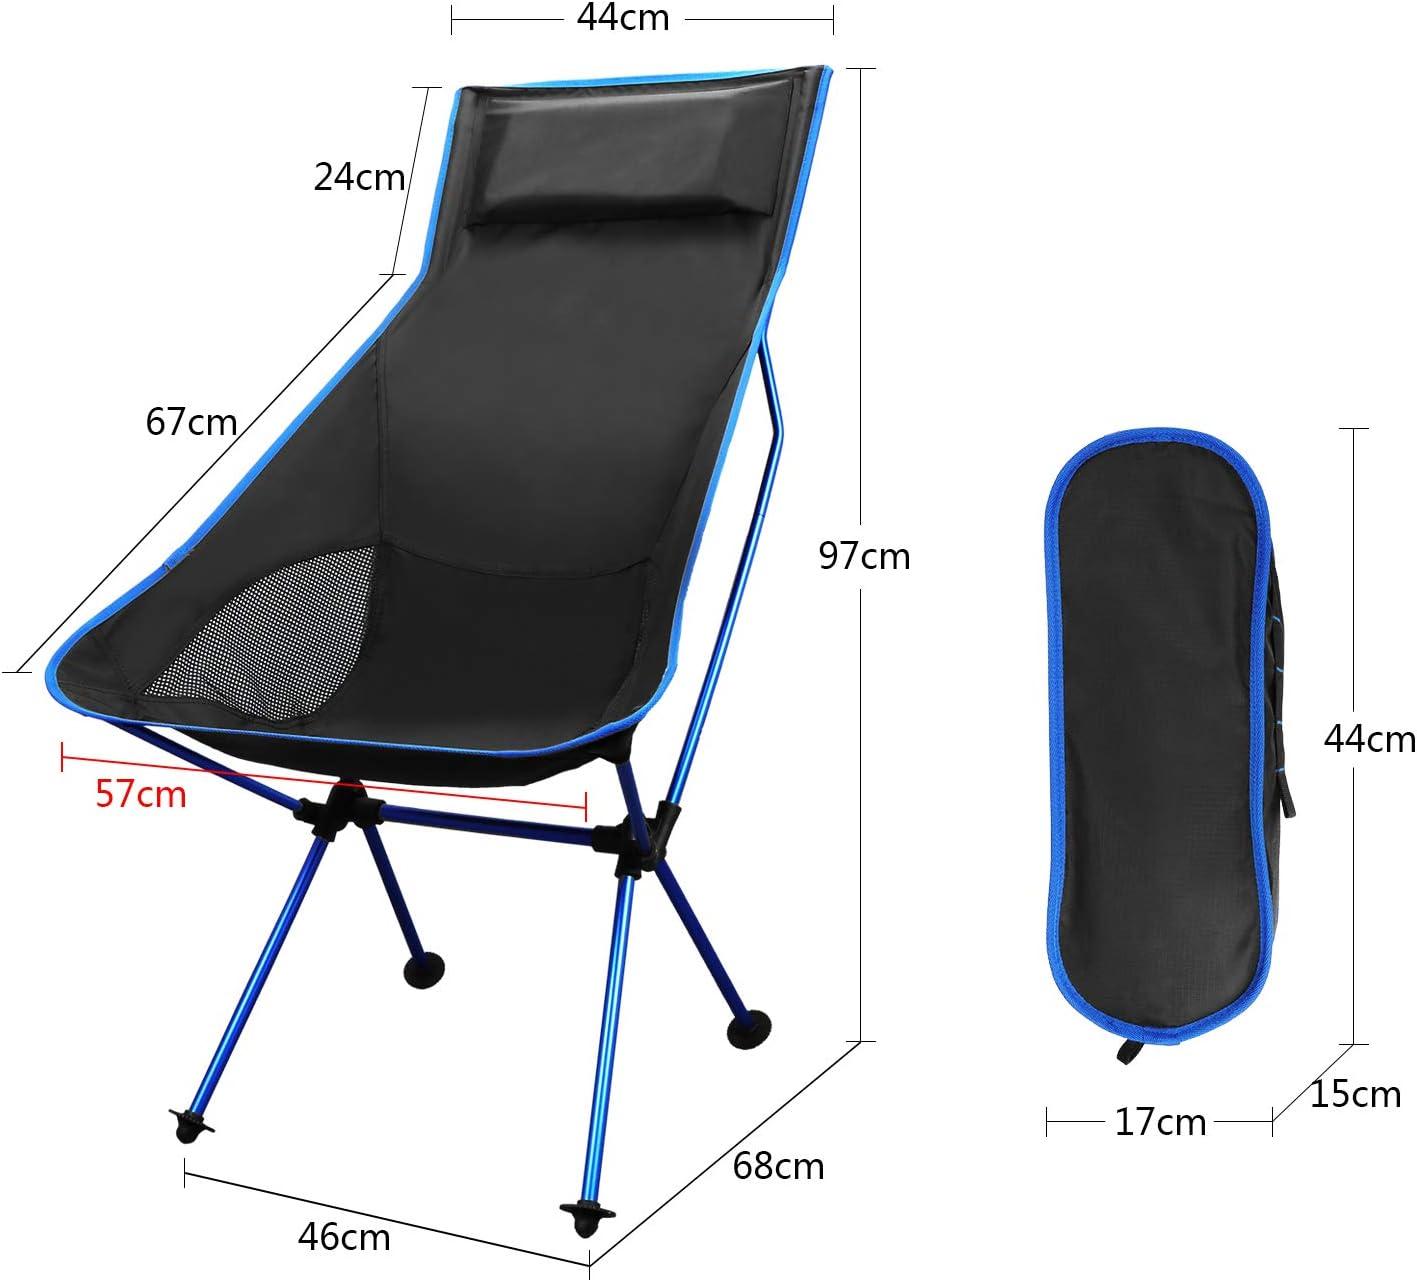 Backpacking Angeln BBQ Picknick TsunNee Falten Camping Stuhl Garten Leicht tragbar Stuhl im Freien mit Tragetasche zum Wandern Strand